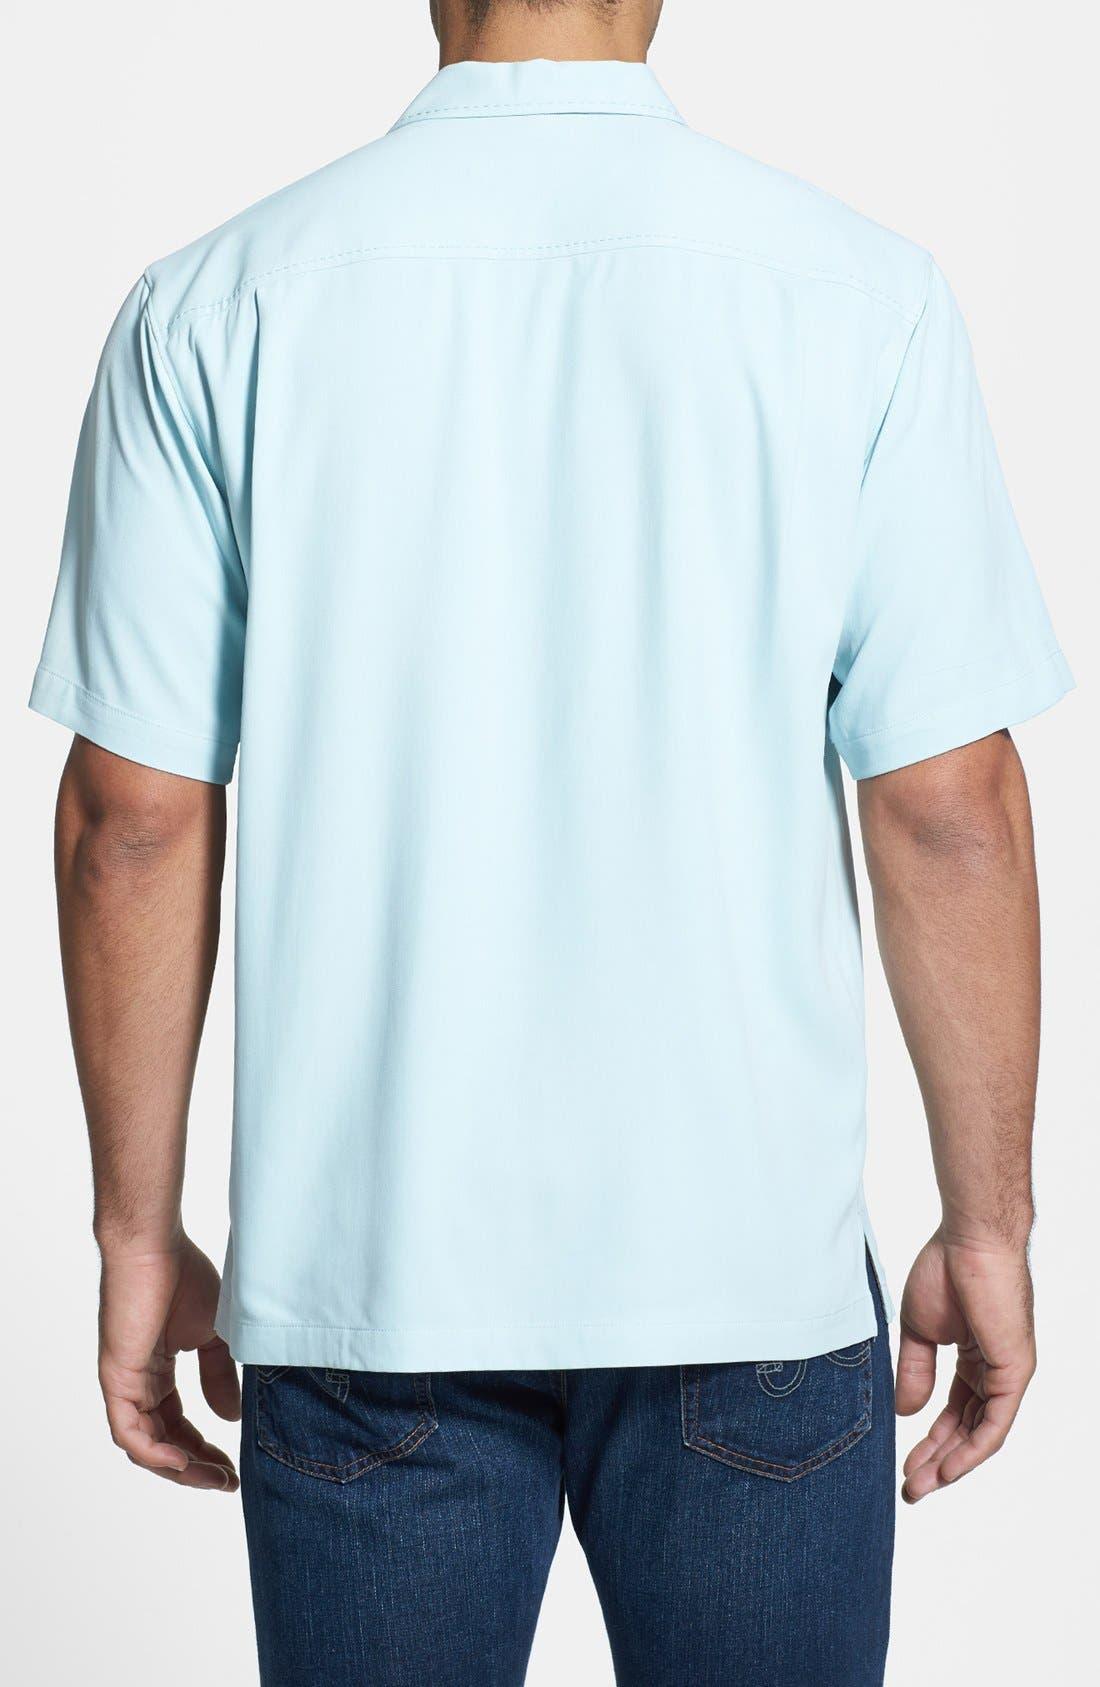 Alternate Image 2  - Tommy Bahama 'Road to Havana' Regular Fit Silk Campshirt (Big & Tall)